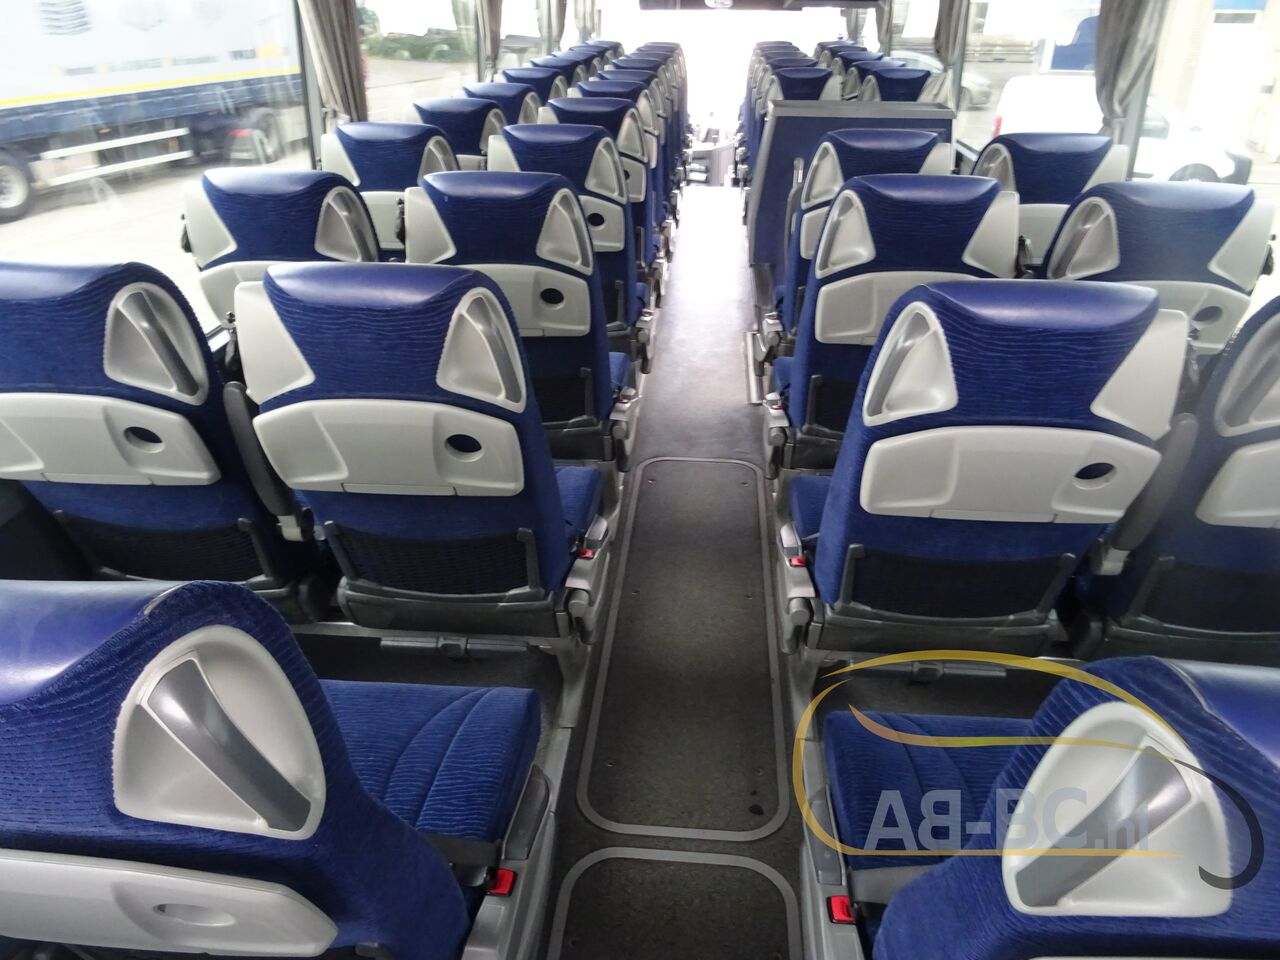 coach-busSETRA-S415-GT-HD-FINAL-EDITION---1627457271213155902_big_ac7158c14b93a4eba2e14cda49162e17--21050713010665719300